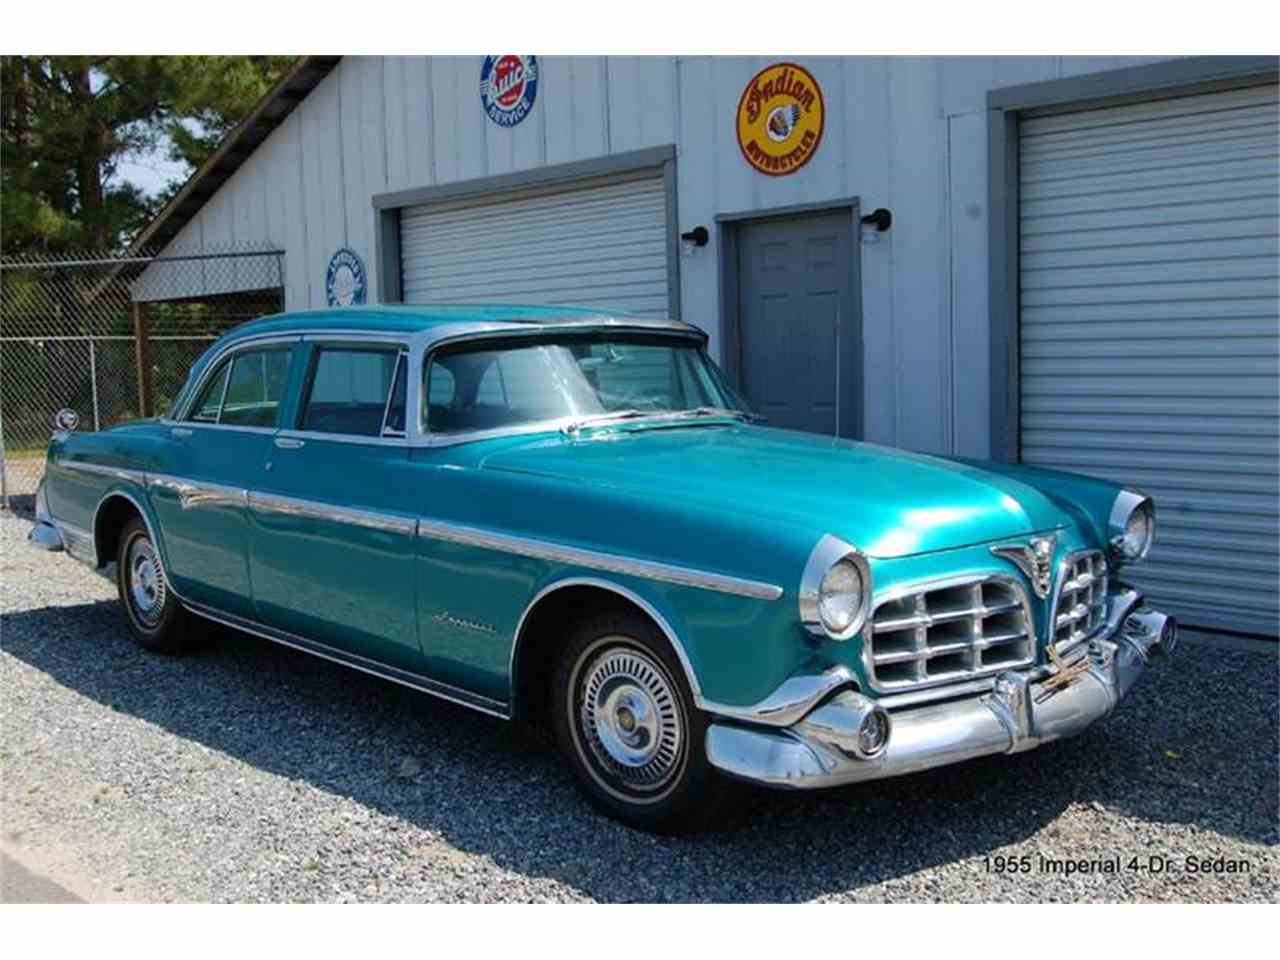 1956 chrysler imperial interior images - 1955 Chrysler Imperial 976971